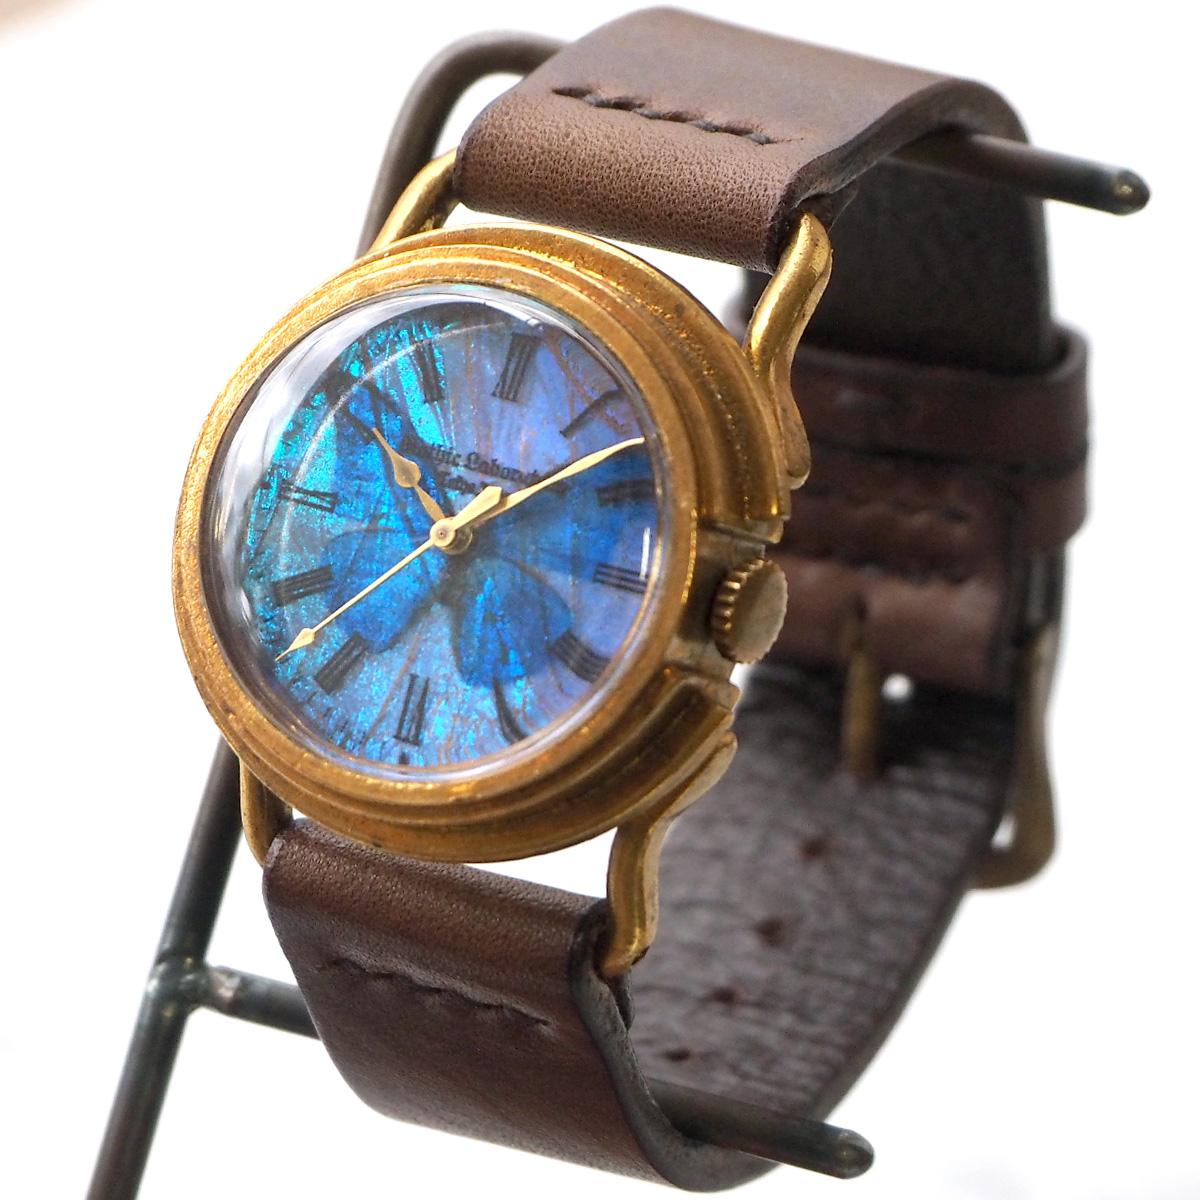 "Gothic Laboratory(ゴシックラボラトリー) 手作り腕時計 ""リアルモルフォ"" -本物の青い蝶の翅- 真鍮 Mサイズ [GL-CW-RM-BR-M] A STORY 柳井幸平 ハンドメイドウォッチ ハンドメイド腕時計 メンズ レディース 青い蝶 クオーツ 日本製 国産"